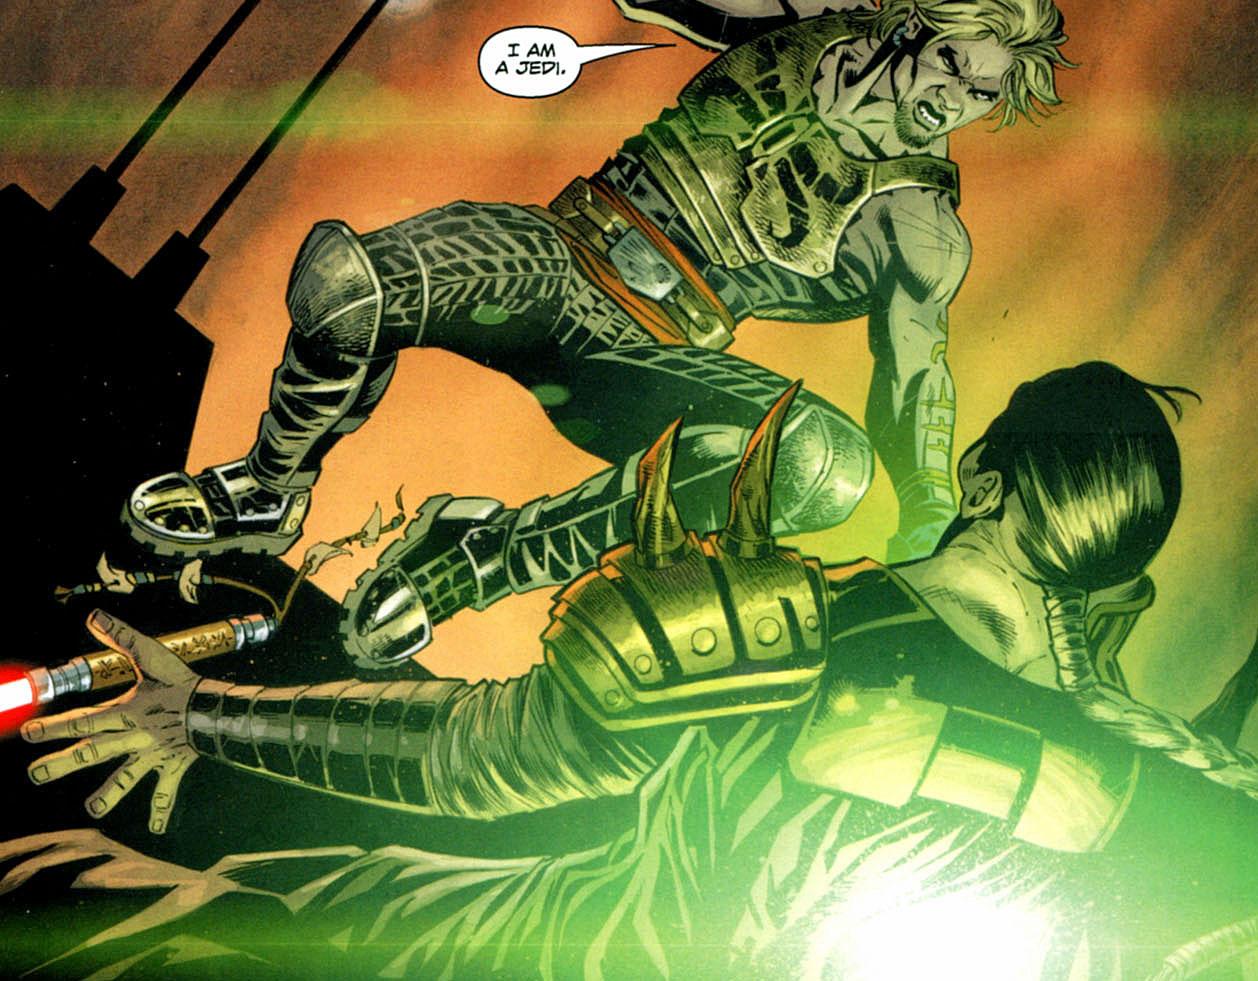 Darth Krayt vs Darth Malgus Darth Krayt's Final Death at